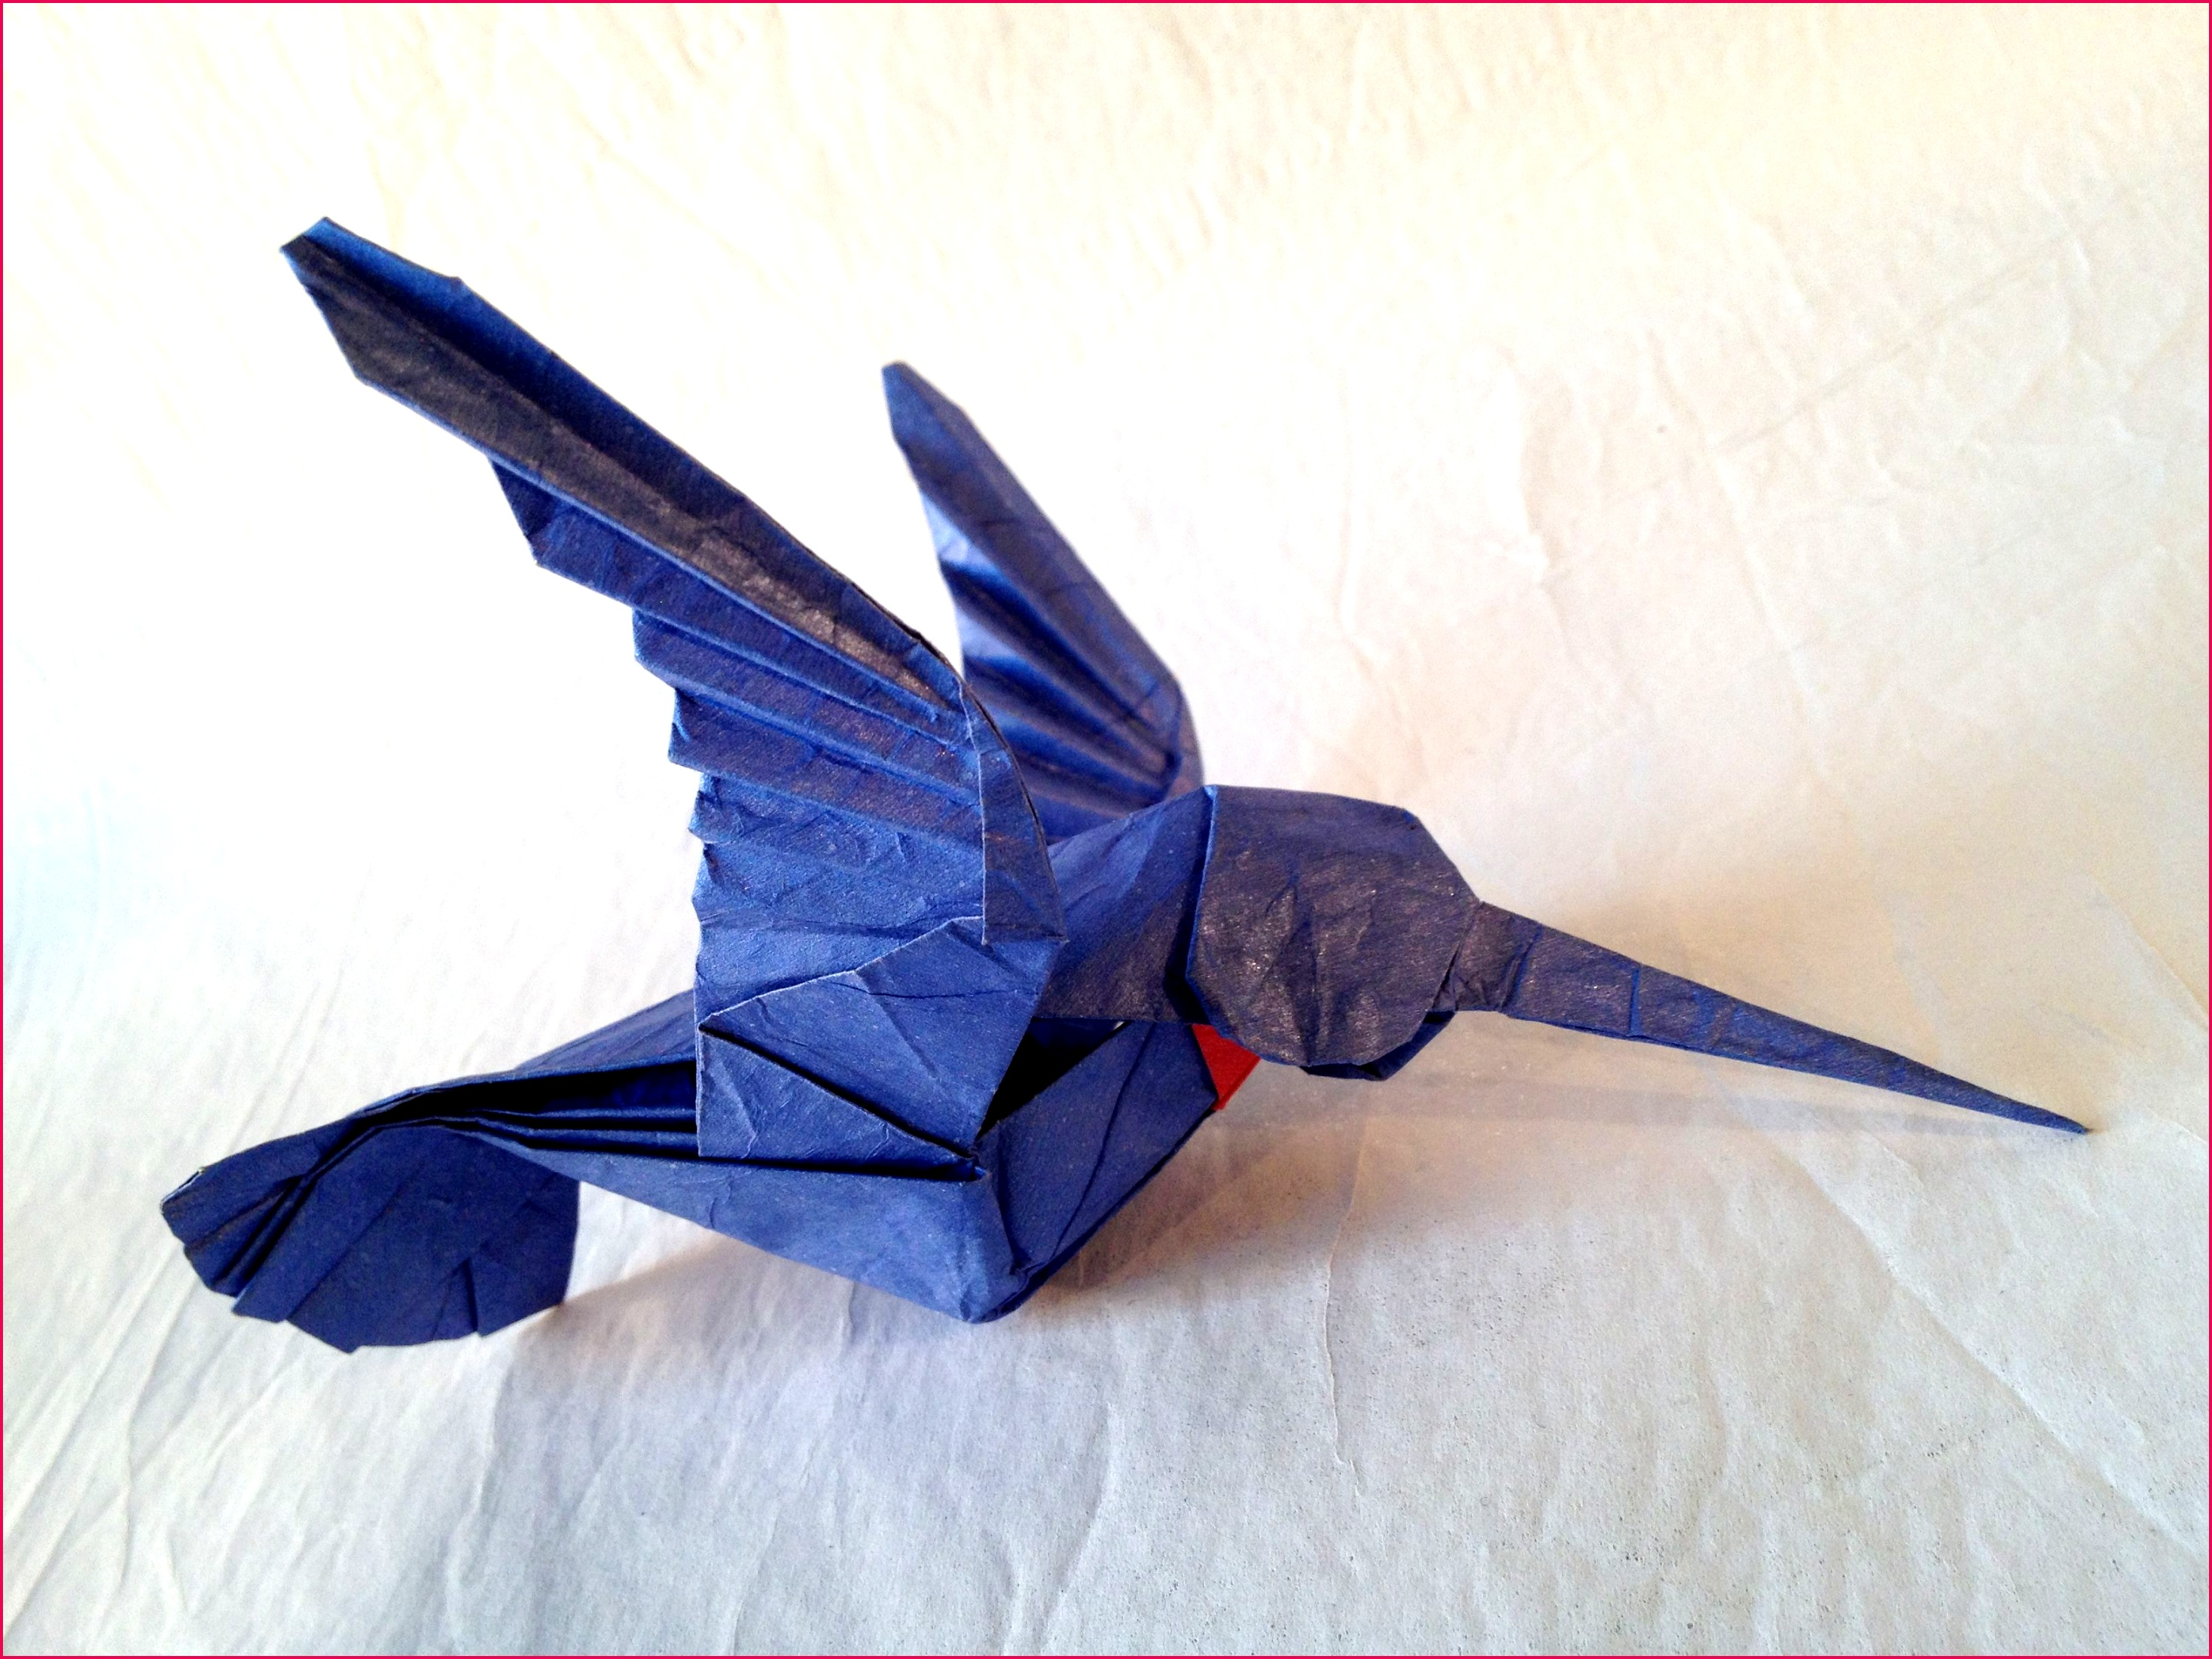 Amazing Origami Paper Hand Craft Paper Crafting Origami Instructions Origami Tutorial Origami